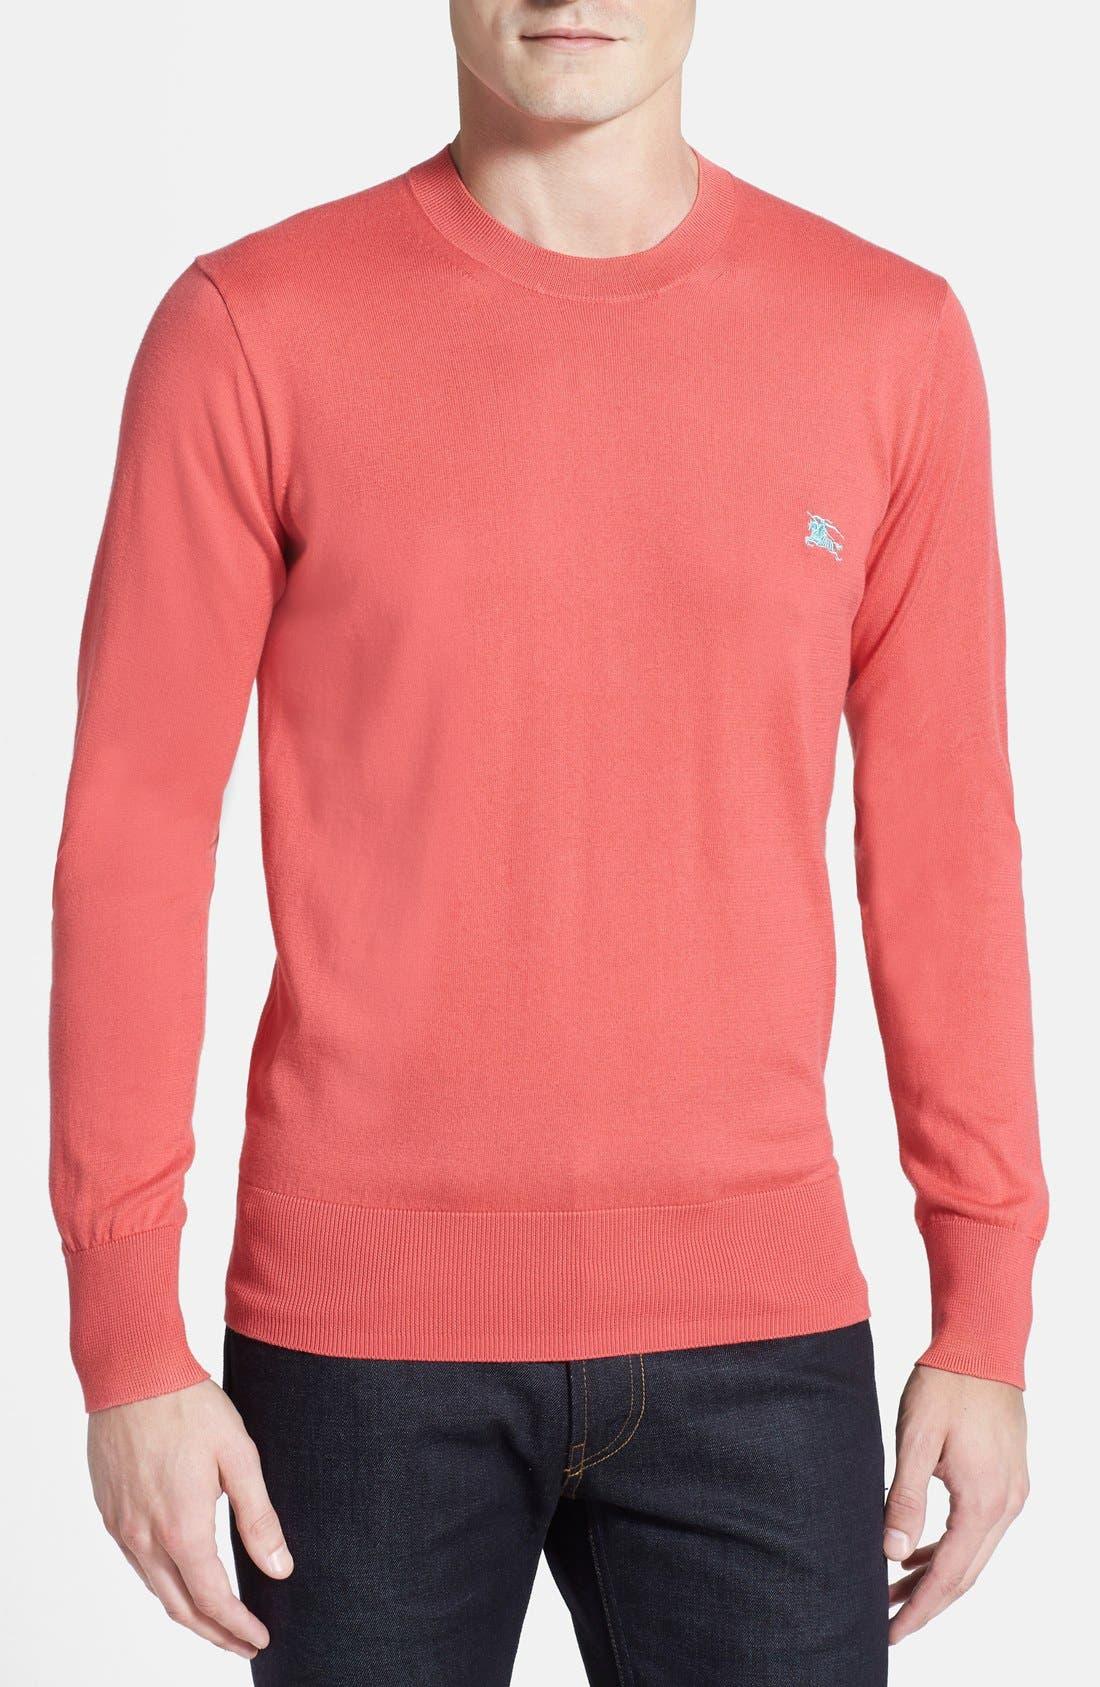 Alternate Image 1 Selected - Burberry 'Arnal' Crewneck Sweater